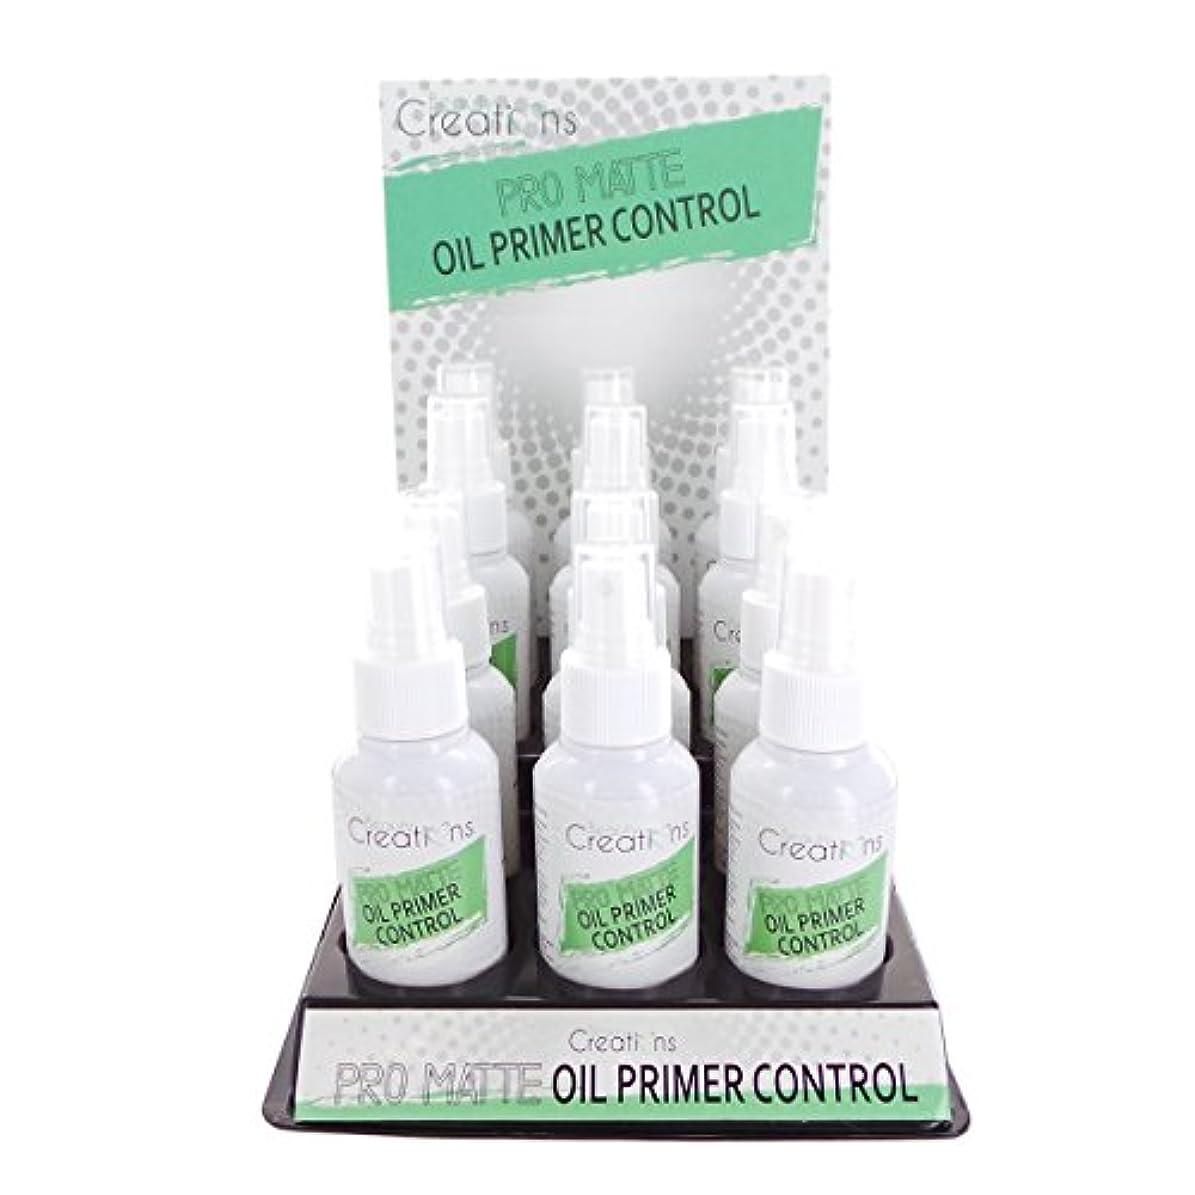 恒久的溶融船員BEAUTY CREATIONS Pro Matte Oil Primer Control Spray Display Set, 12 Pieces (並行輸入品)